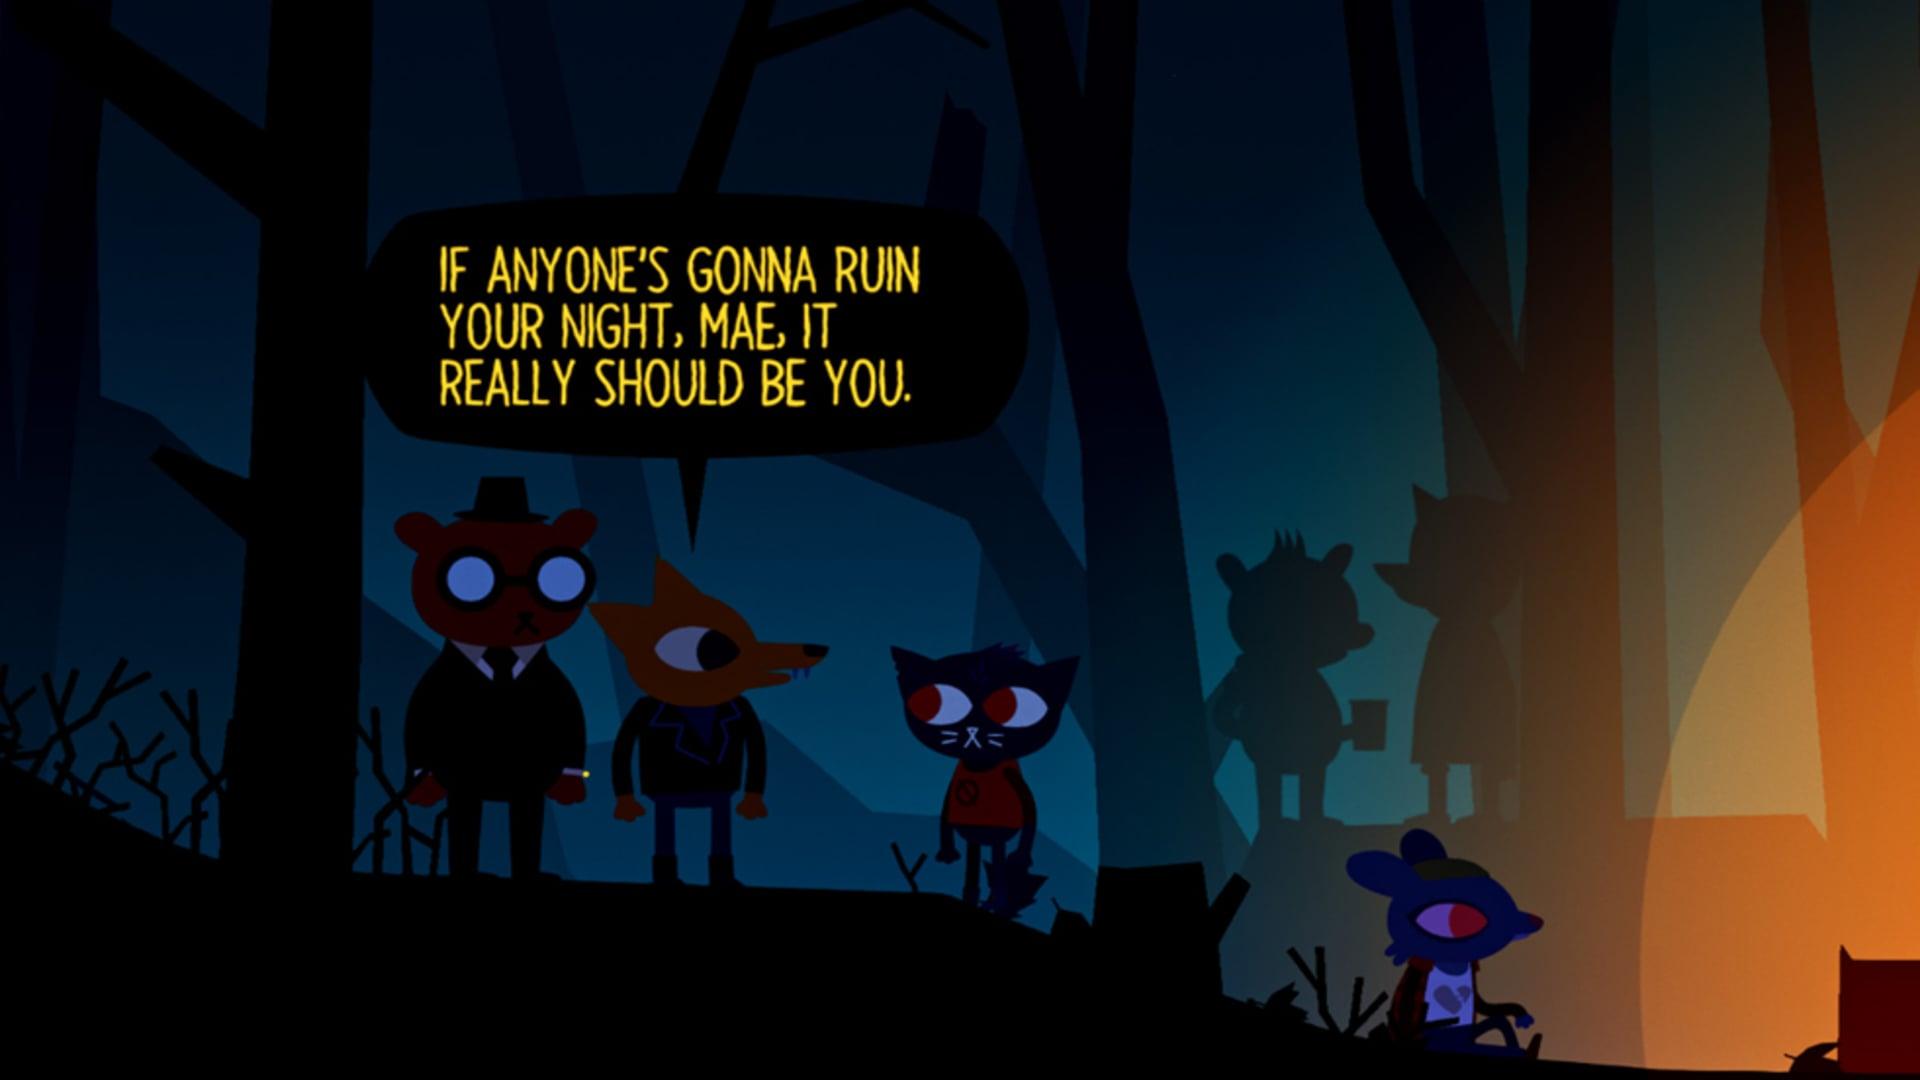 Slutförsenat – Night in the Woods ute nu